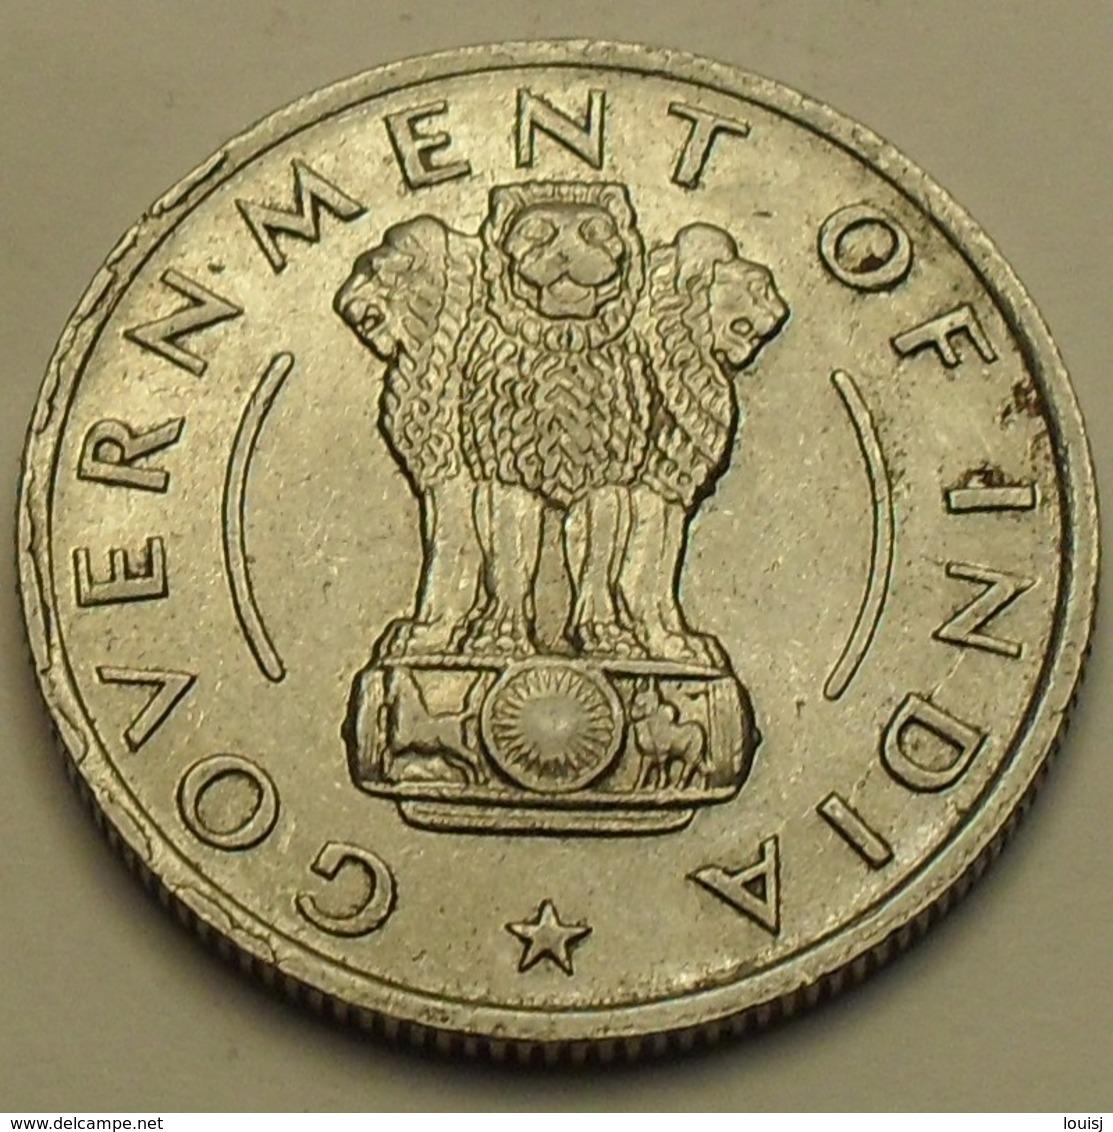 1956 - Inde République - India Republic - 1/2 RUPEE, Calcutta, KM 6.3 - Inde